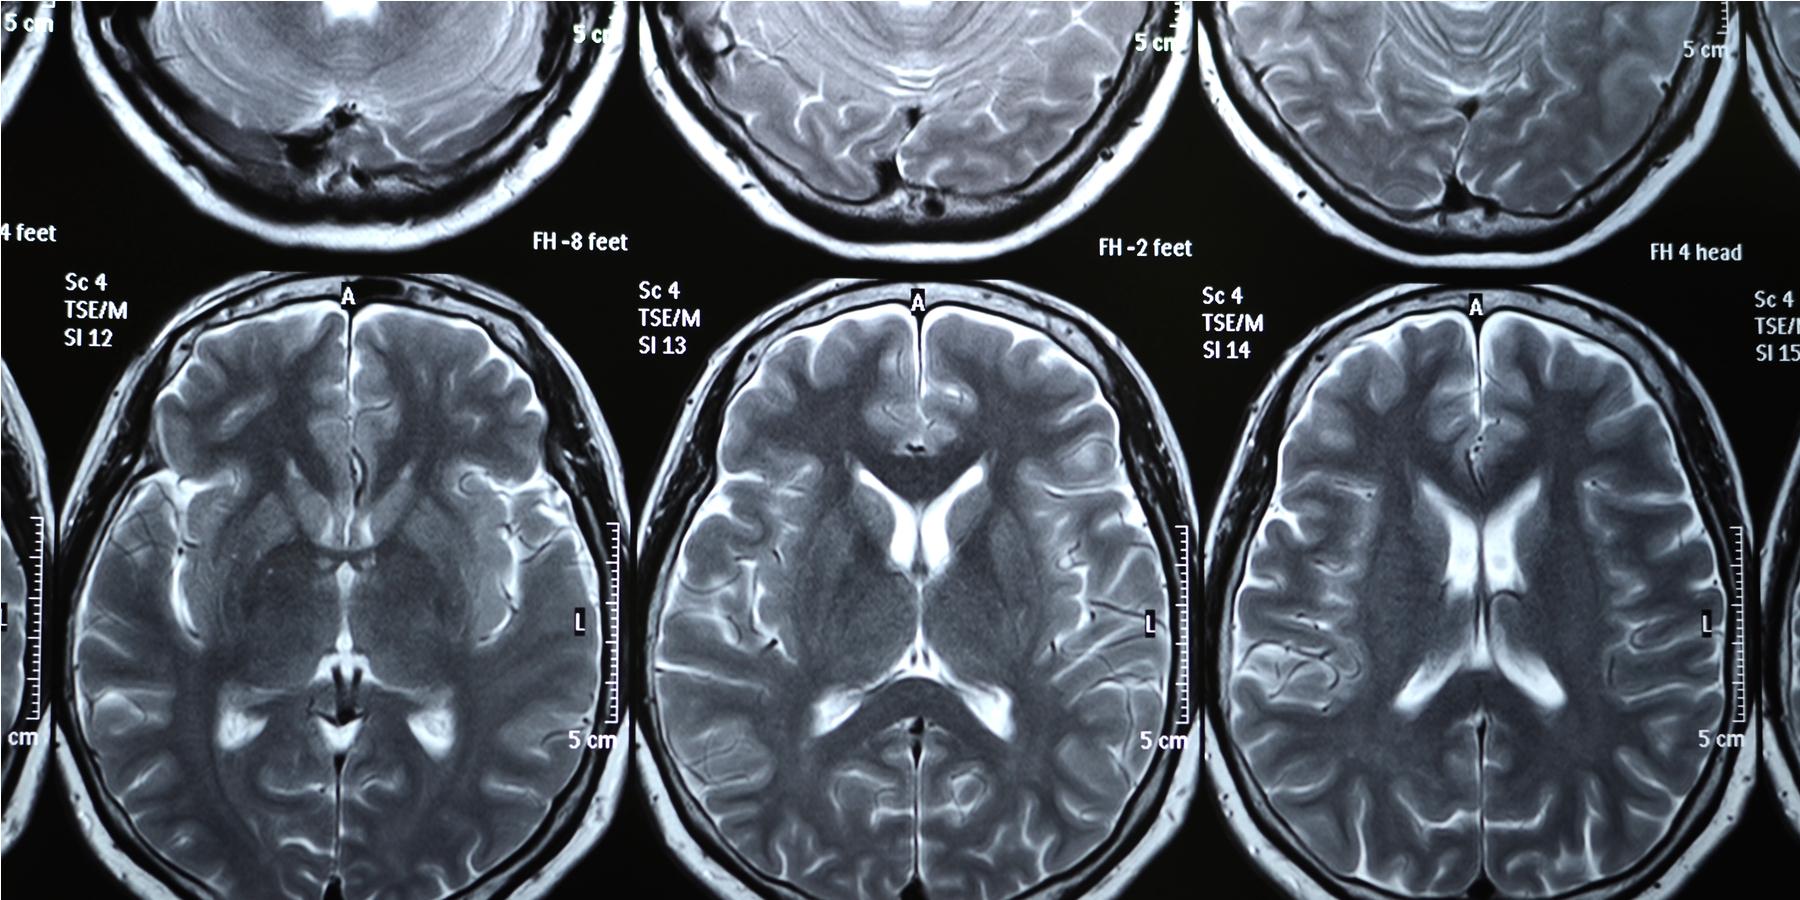 Brain Imaging Studies Seek Signs Of >> Diagnostic Brain Imaging In Psychiatry Current Uses And Future